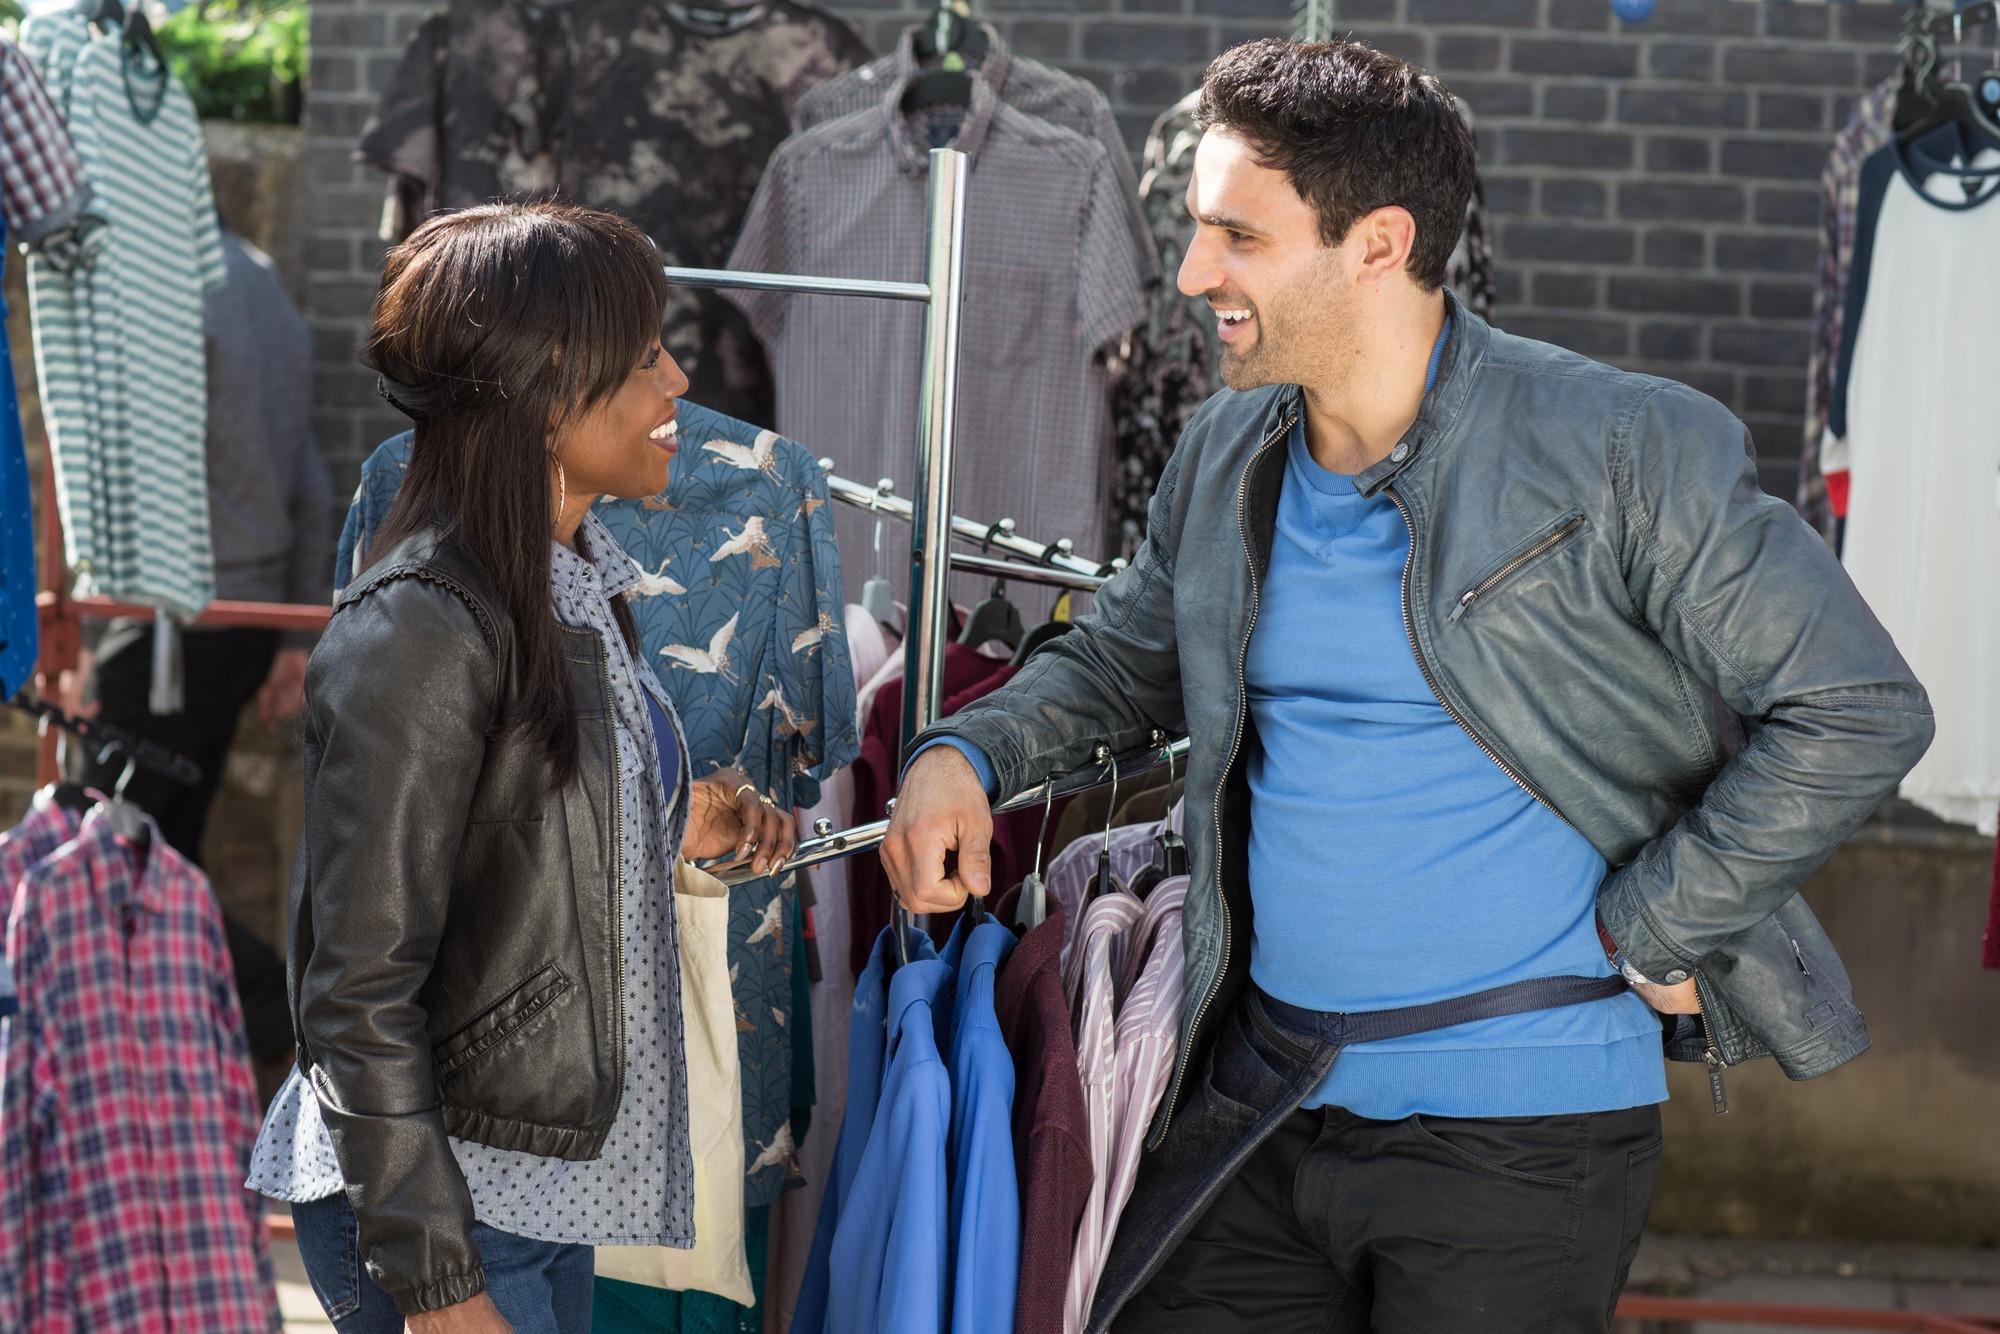 EastEnders spoilers: Denise Fox and Kush Kazemi reunited at last as she confesses her love?